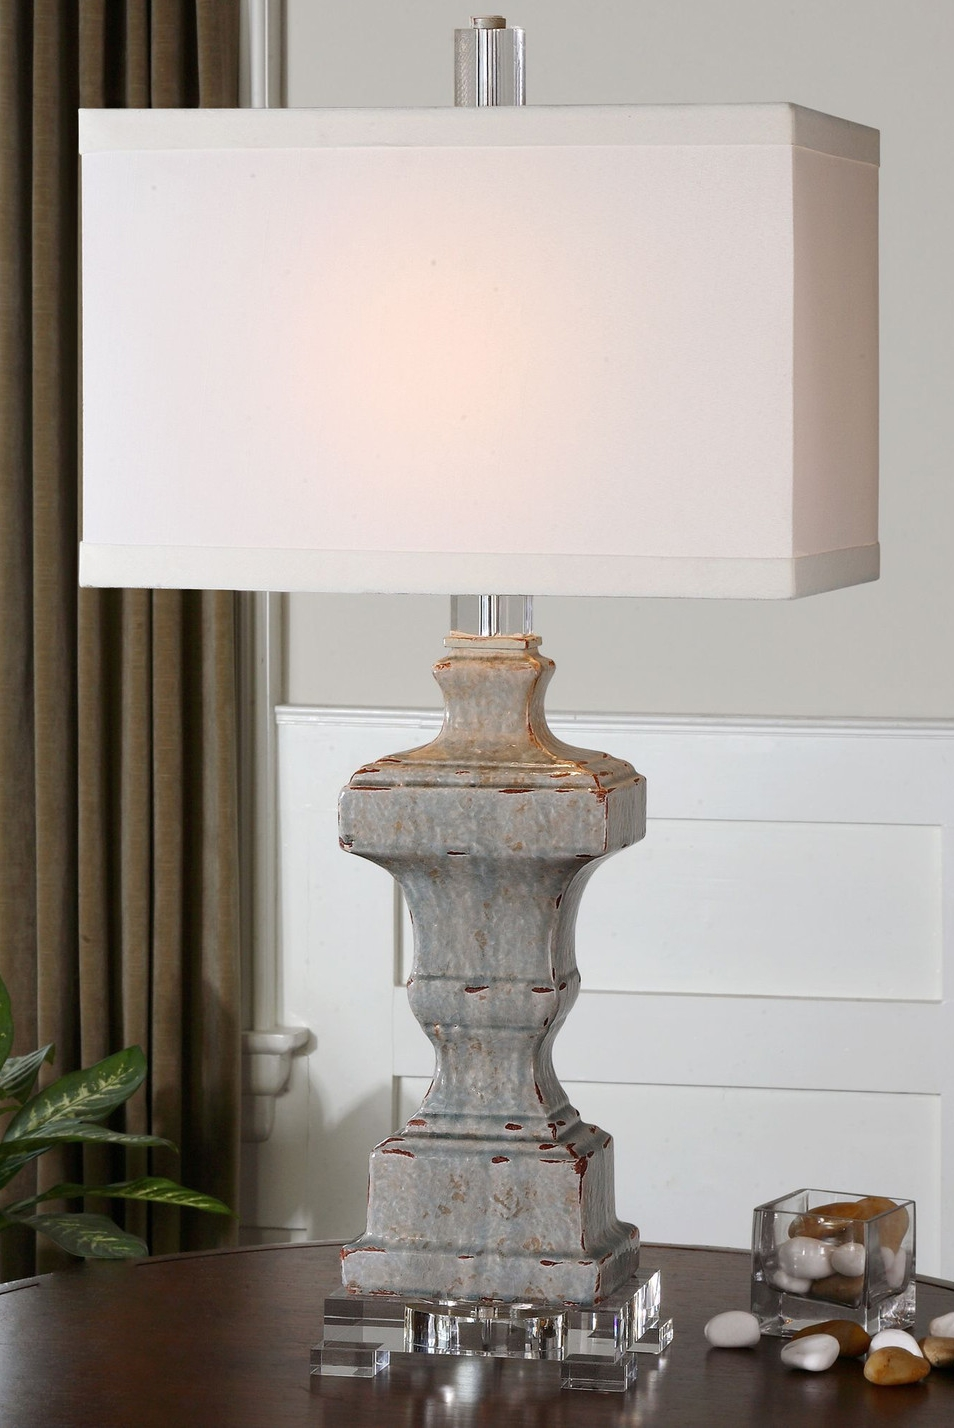 San+Marcello+Table+Lamp.jpg